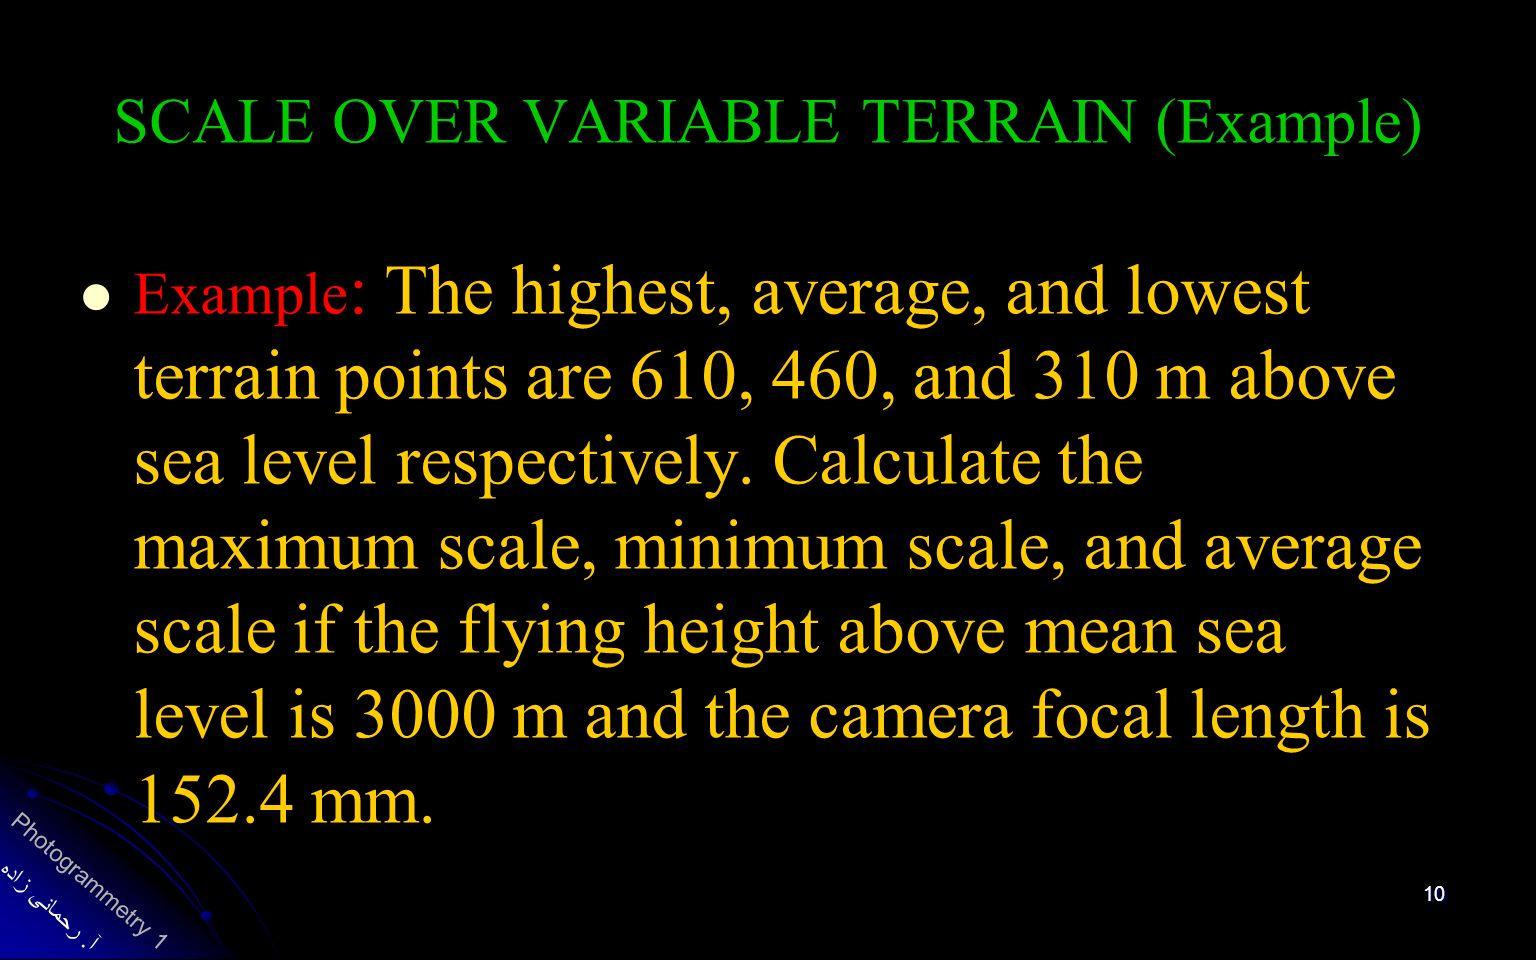 فصل مشخصات و هندسه عکس قائم Ppt Video Online Download - Above sea level calculator